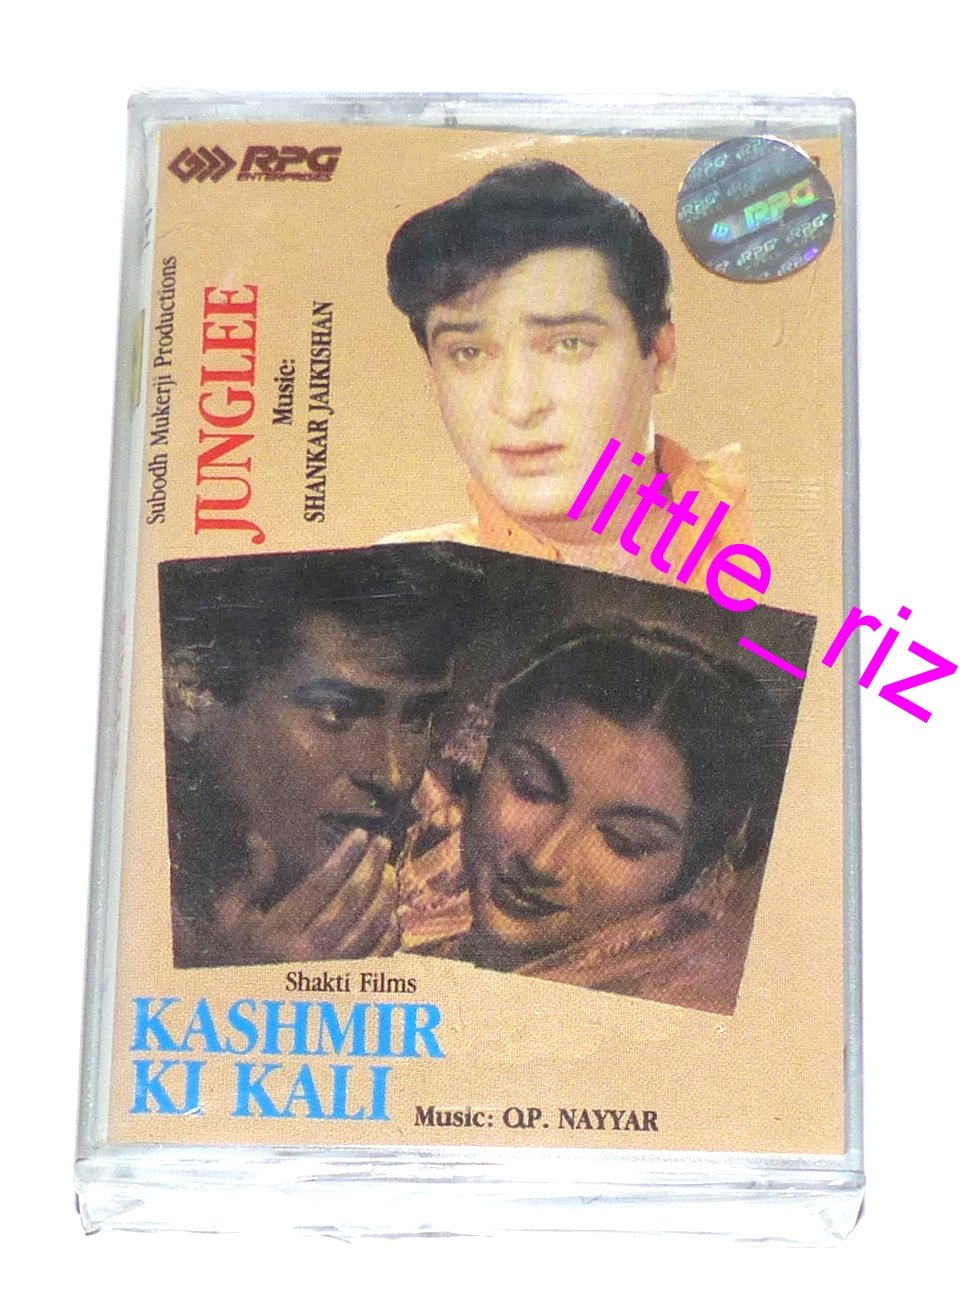 Junglee / Kashmir Ki Kali � Bollywood Indian Cassette Tape Shankar Jaikishan, O.P. Nayyar